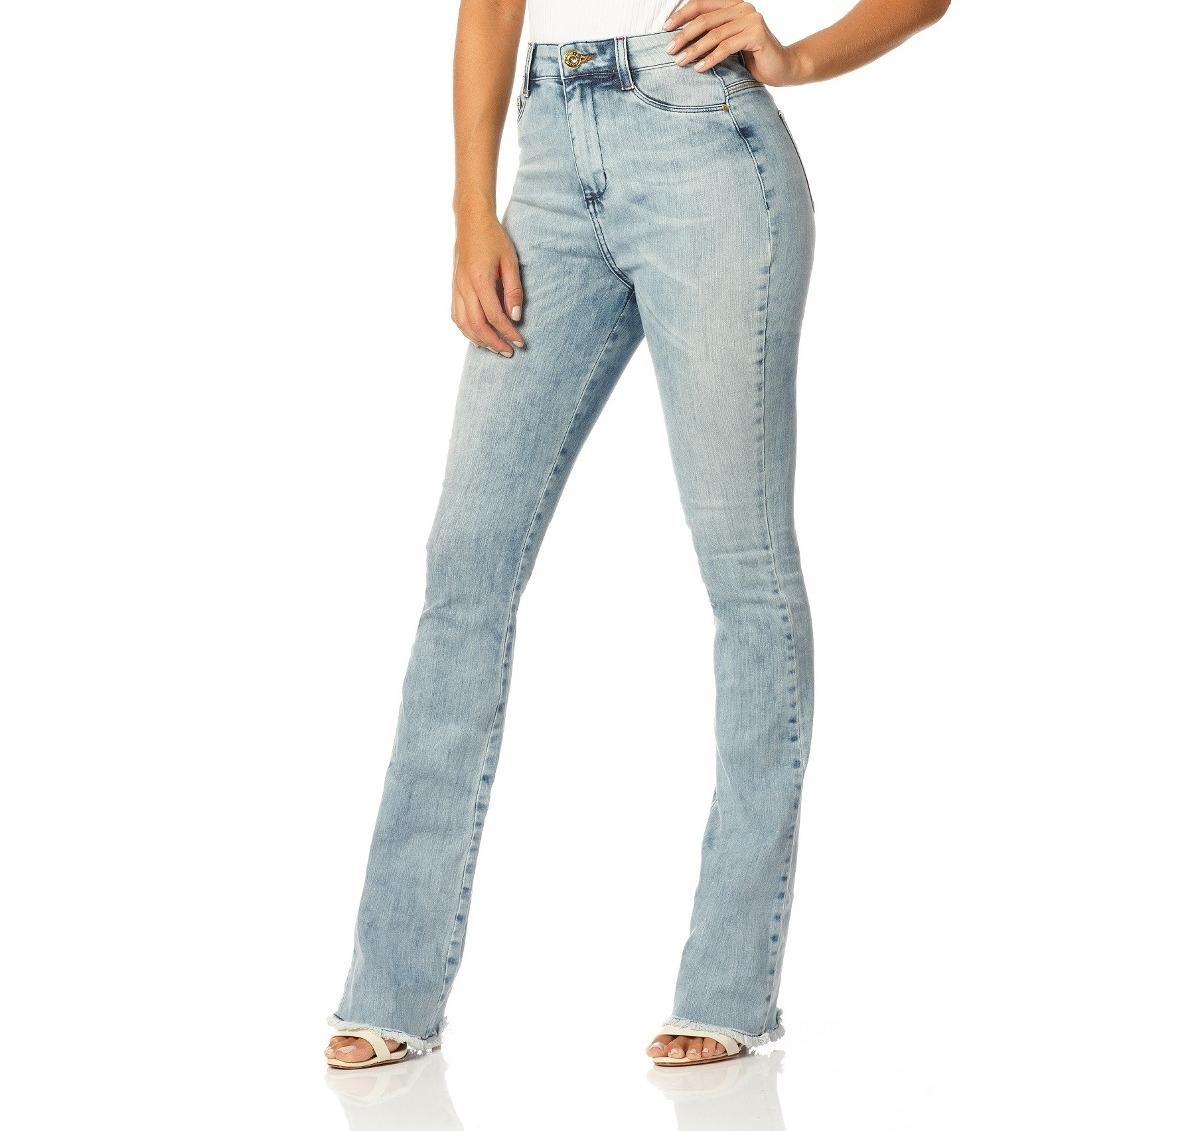 90ffb3f68 calça feminina boot cut hot pants clara denim zero - dz2225. Carregando  zoom.